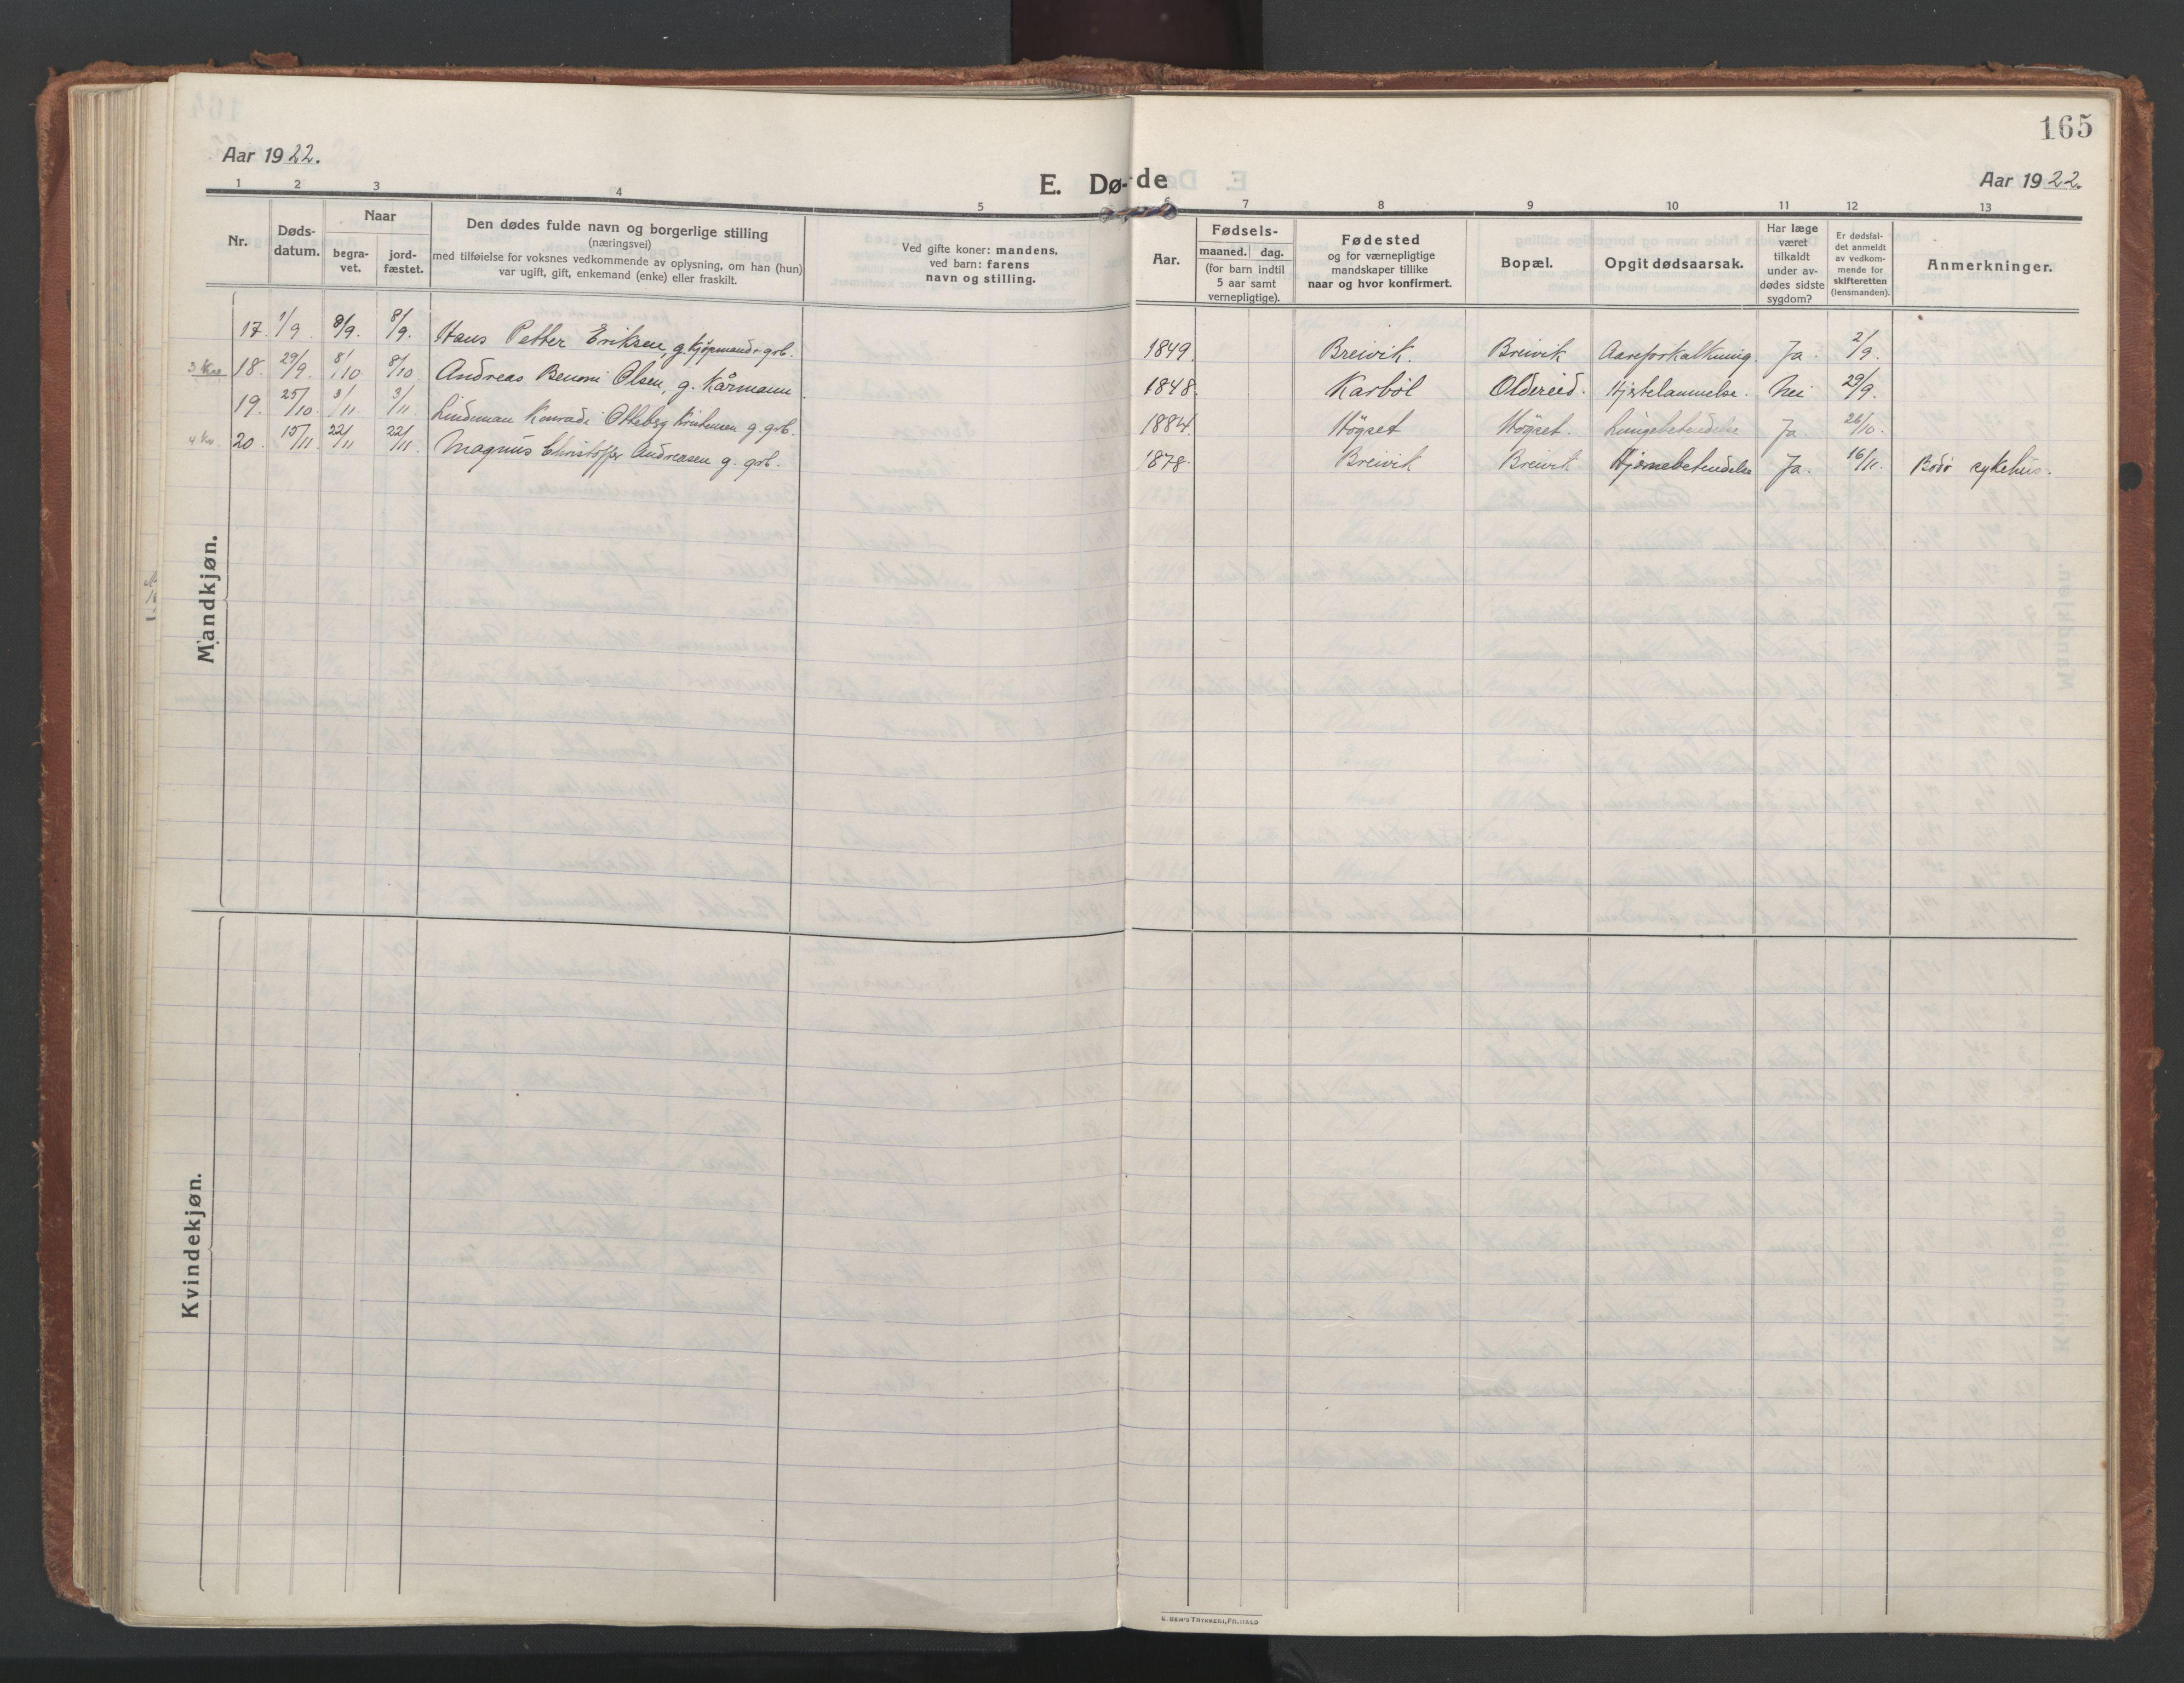 SAT, Ministerialprotokoller, klokkerbøker og fødselsregistre - Nordland, 852/L0748: Ministerialbok nr. 852A18, 1913-1932, s. 165